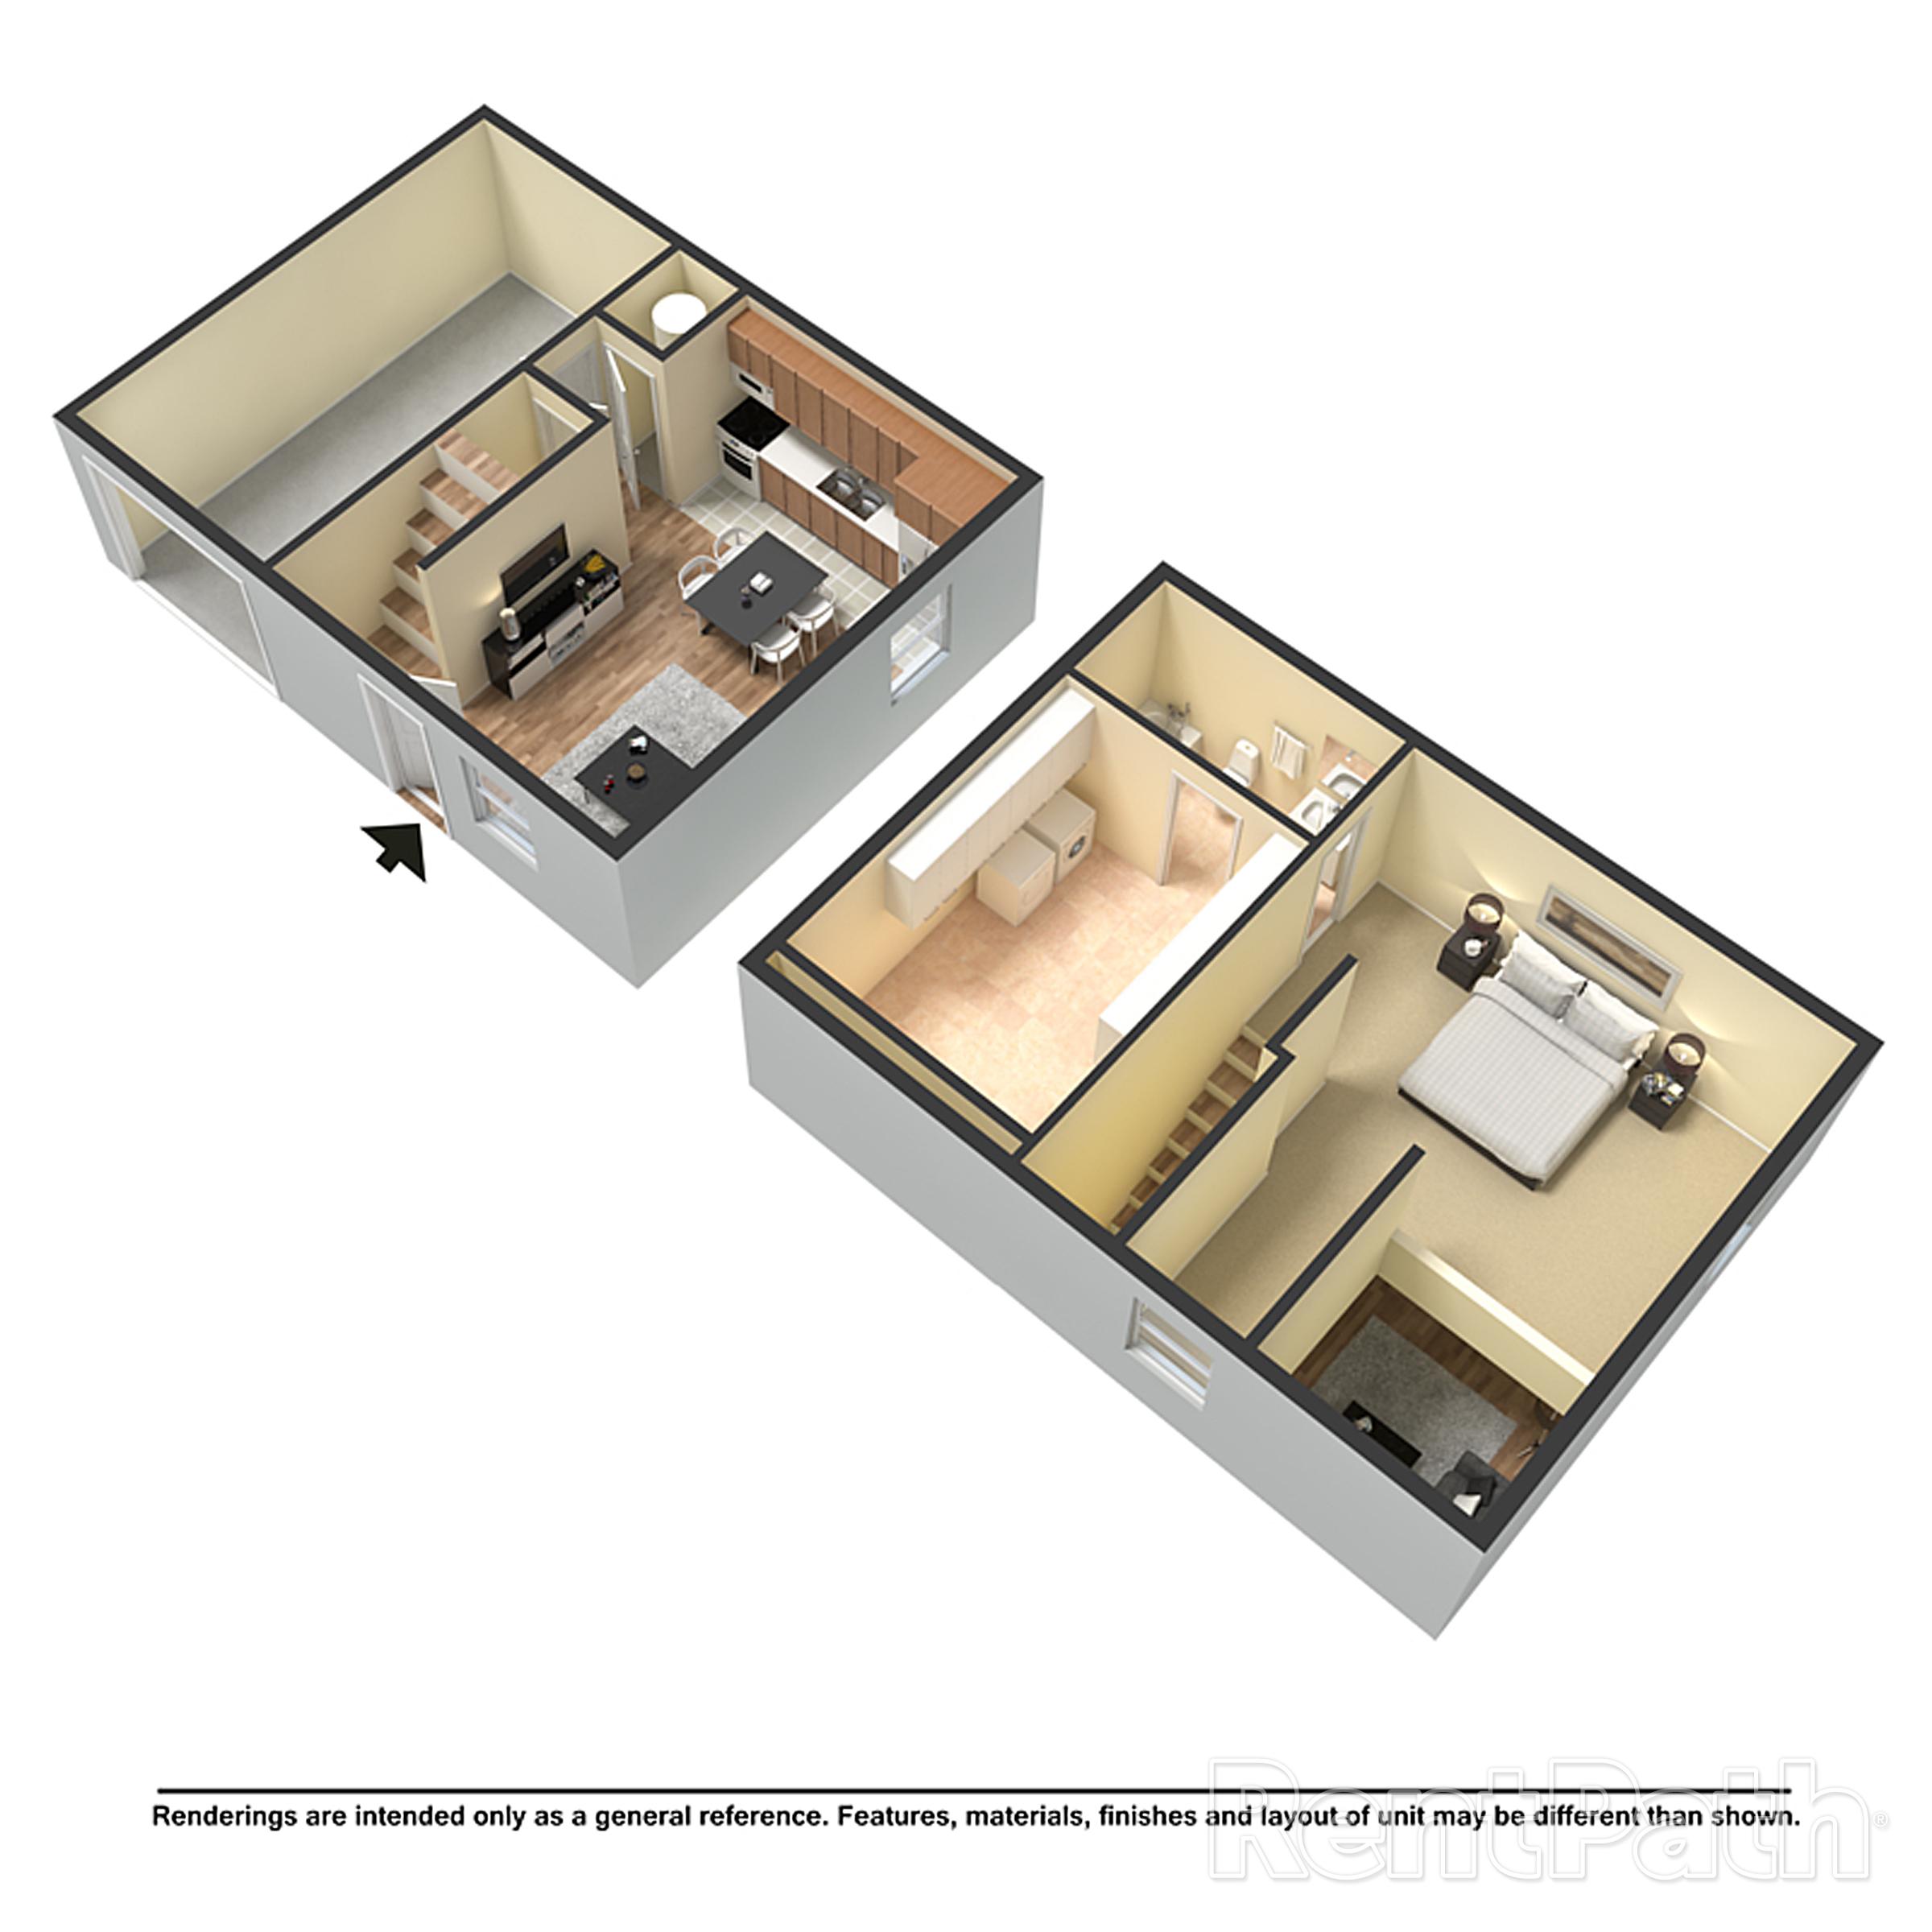 3d 1 bedroom townhouse floorplan.jpg